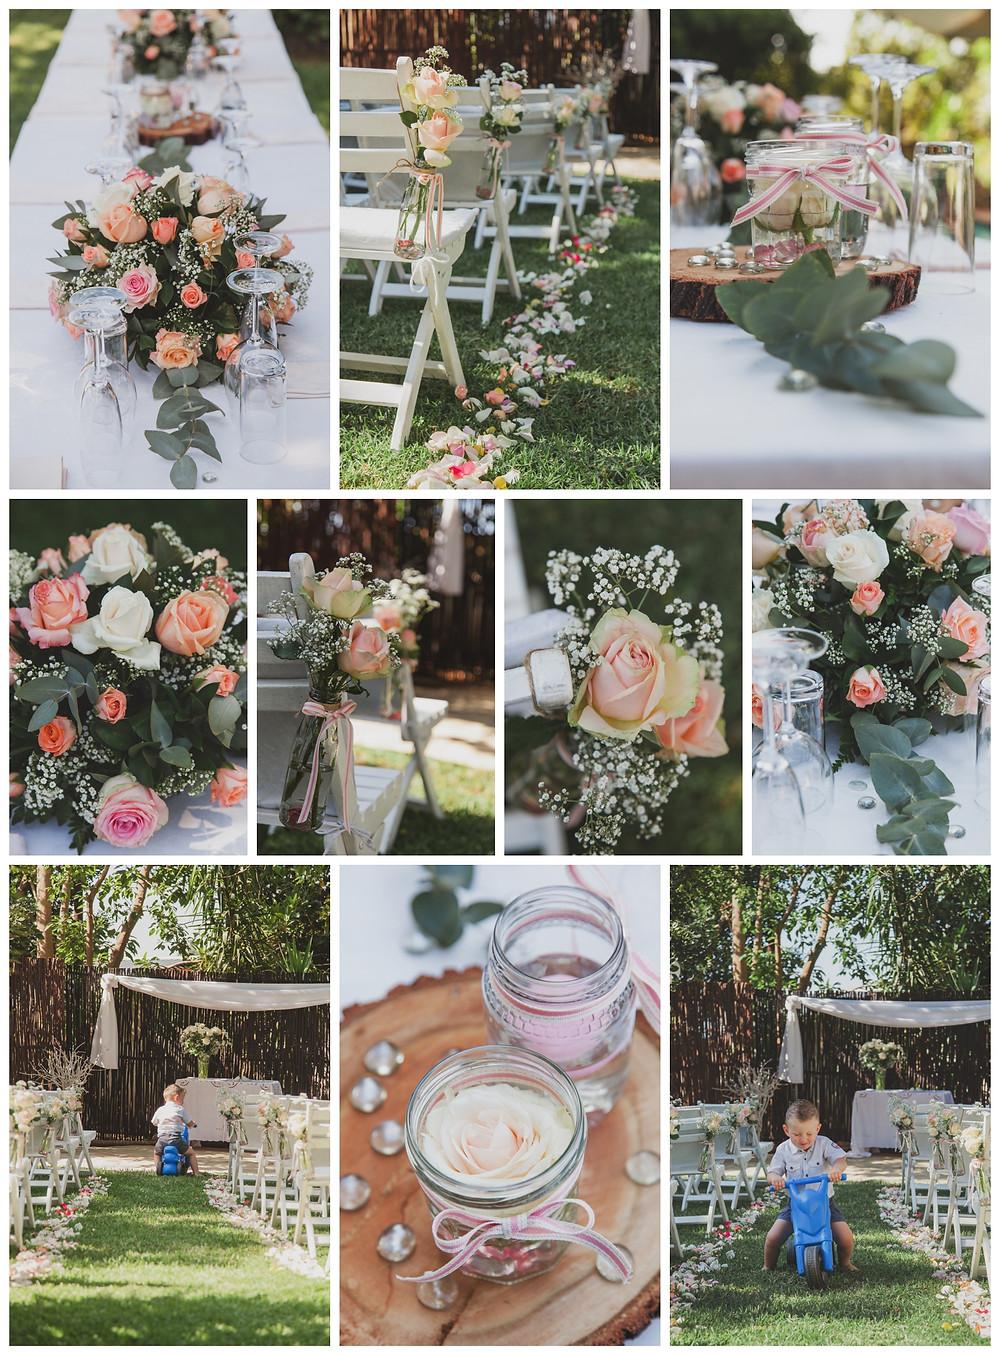 Craig and Nadine's garden wedding ceremony - decor